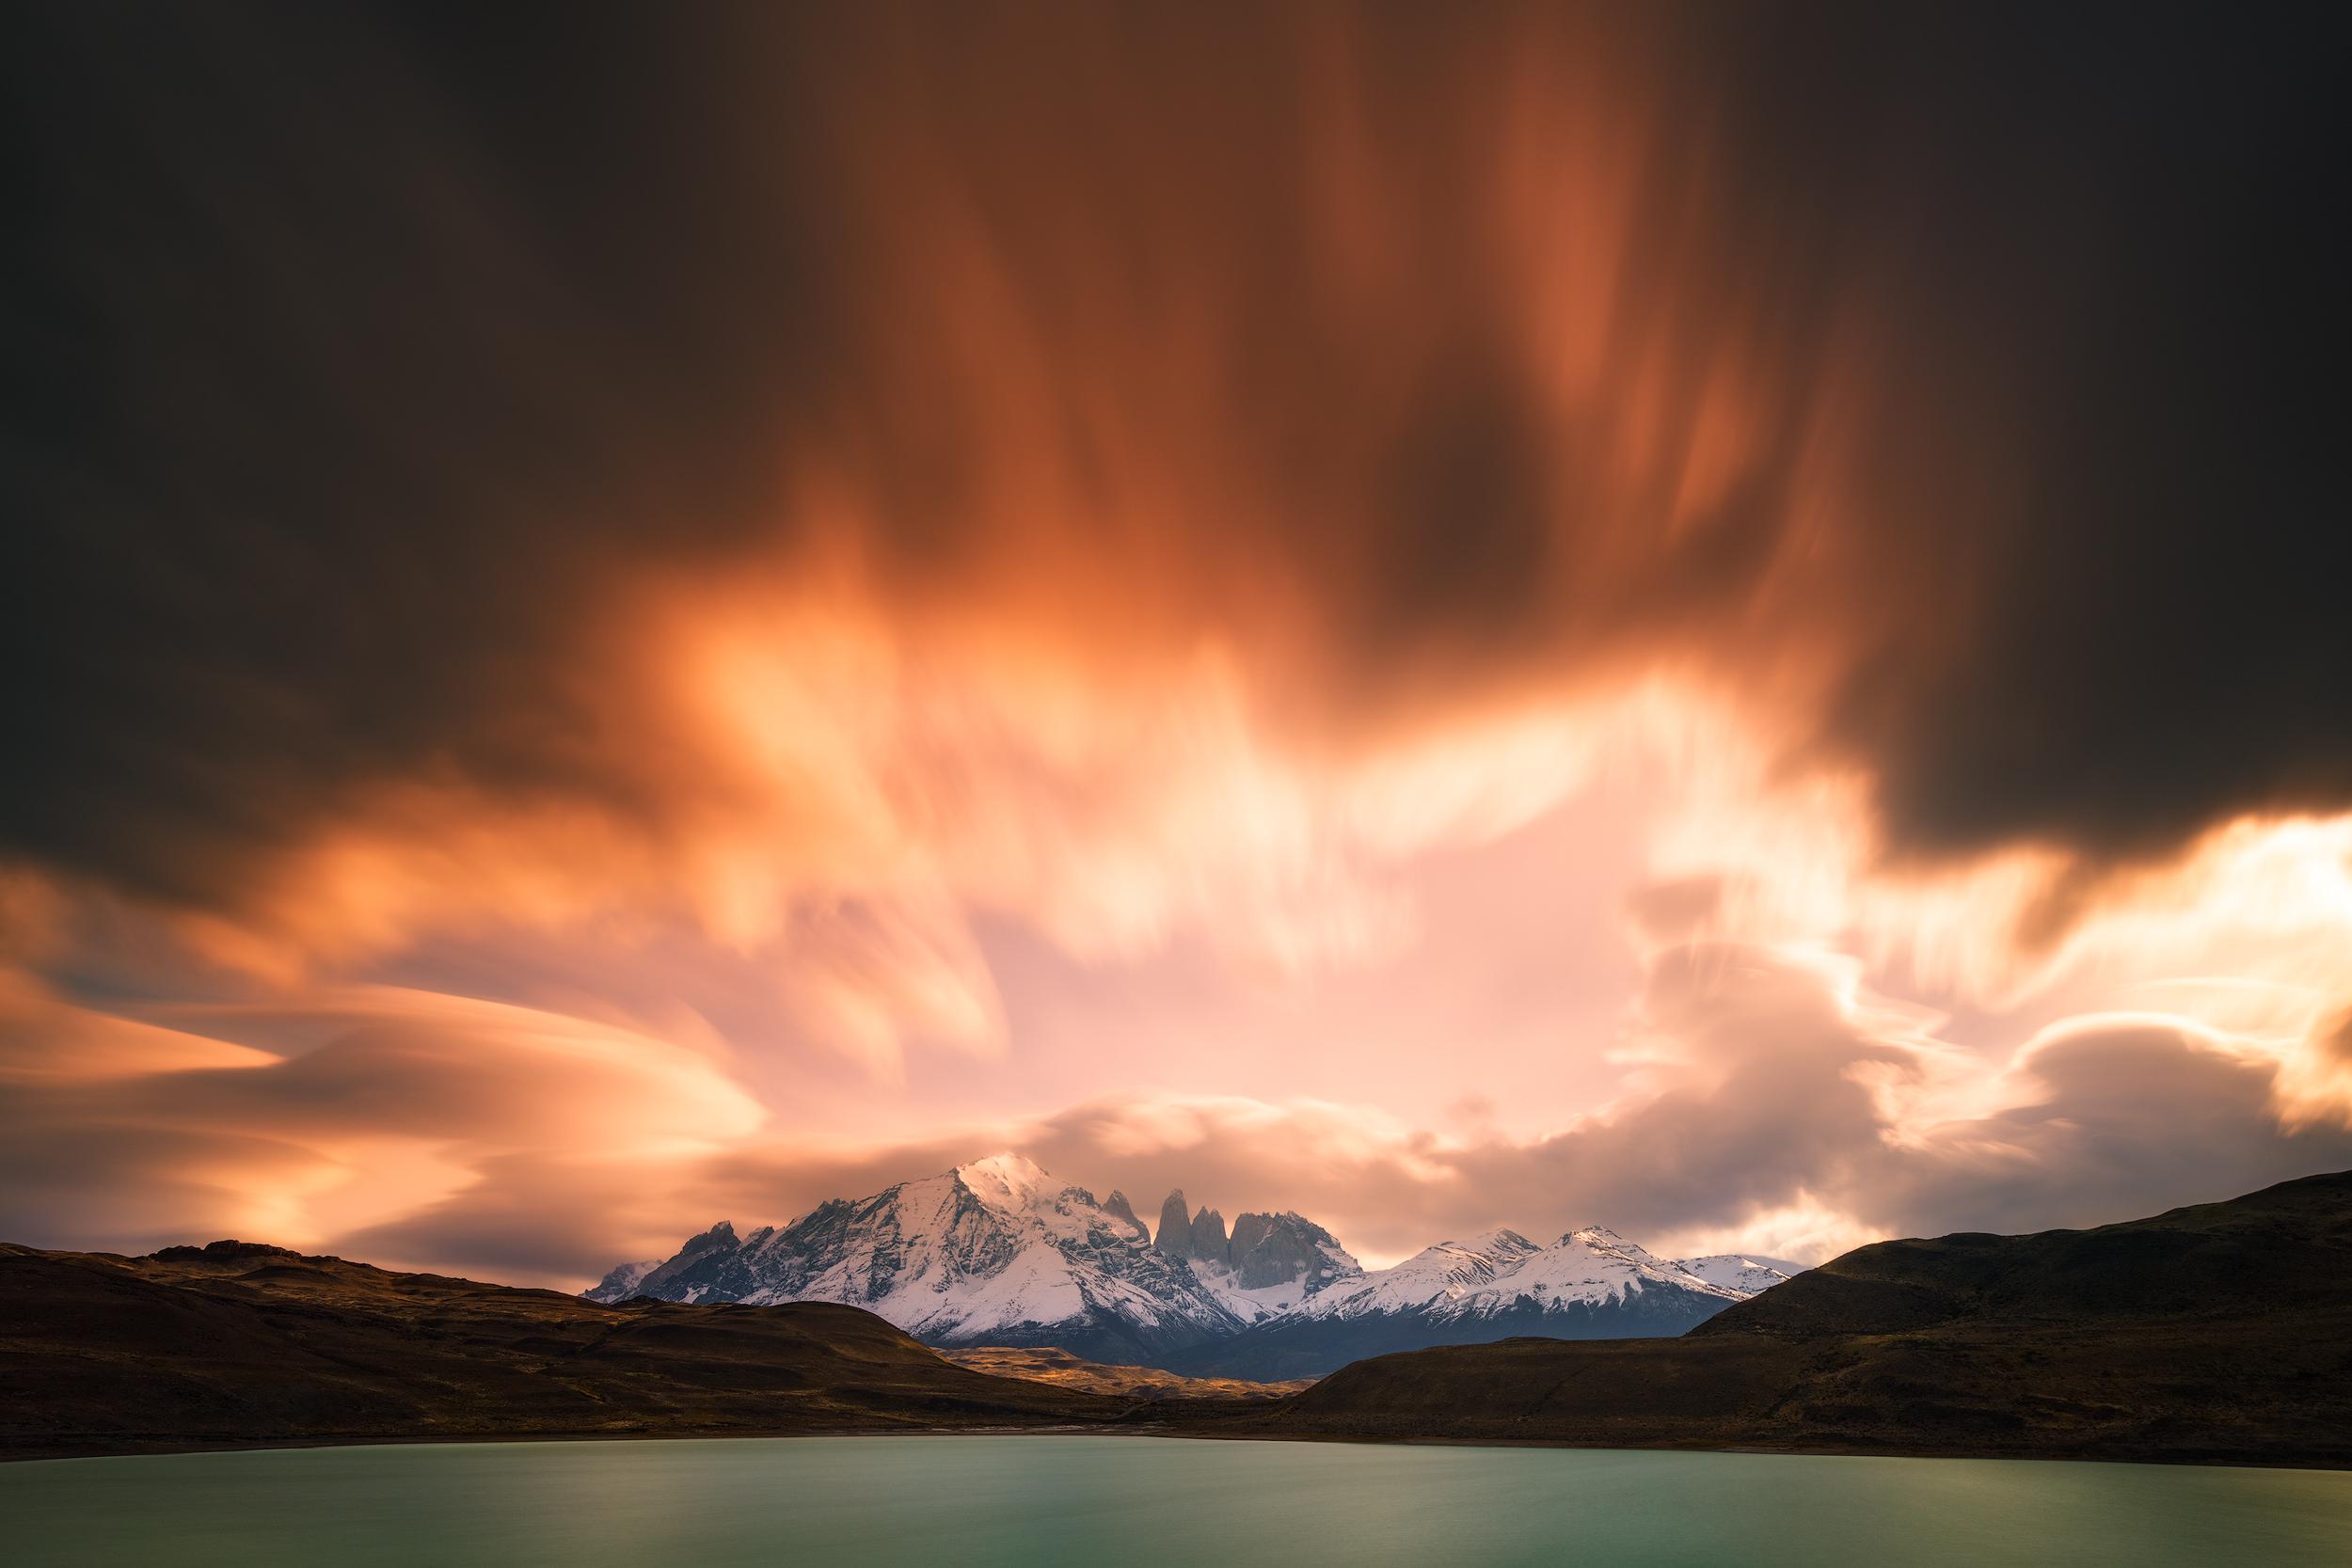 PatagoniaSunrise.jpg